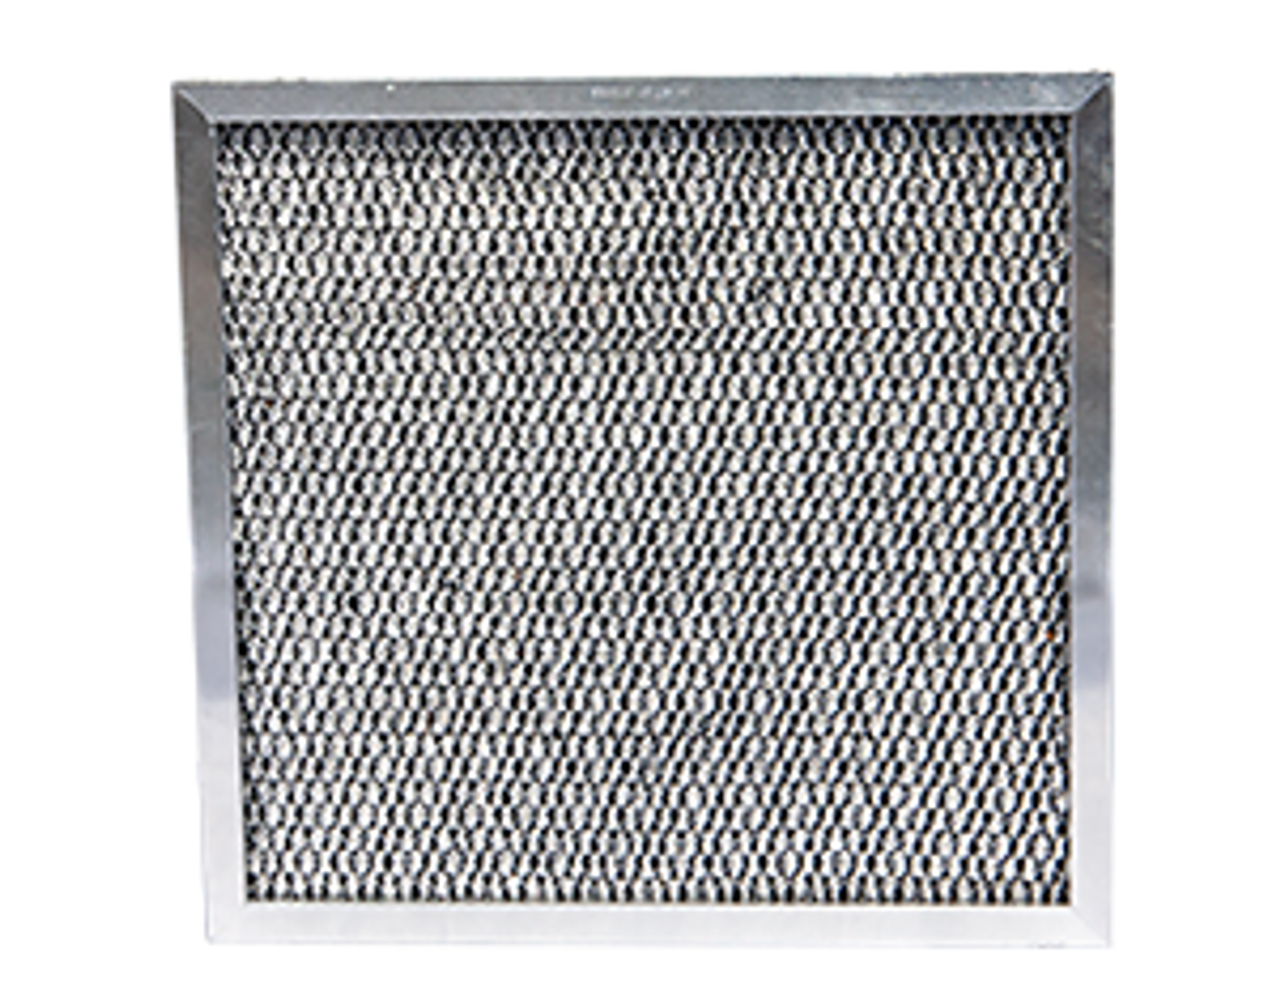 Dri‑Eaz 4‑PRO Four‑Stage Air Filter for LGR7000 & DrizAir 1200 (3 PK)